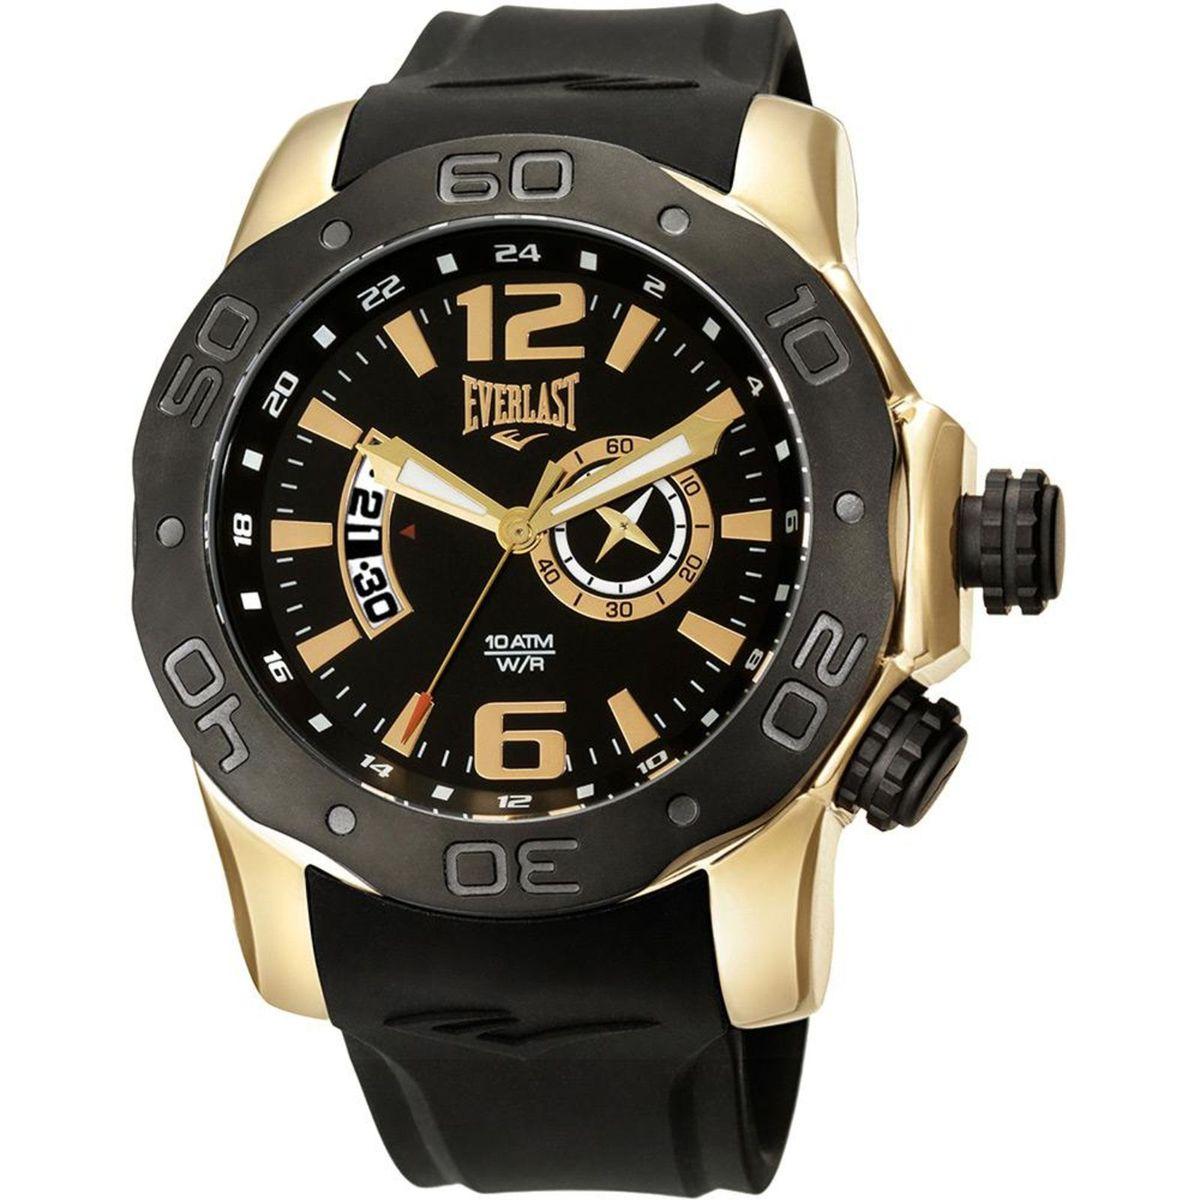 52a635ad7b6 Relógio Masculino Everlast Analógico Esportivo